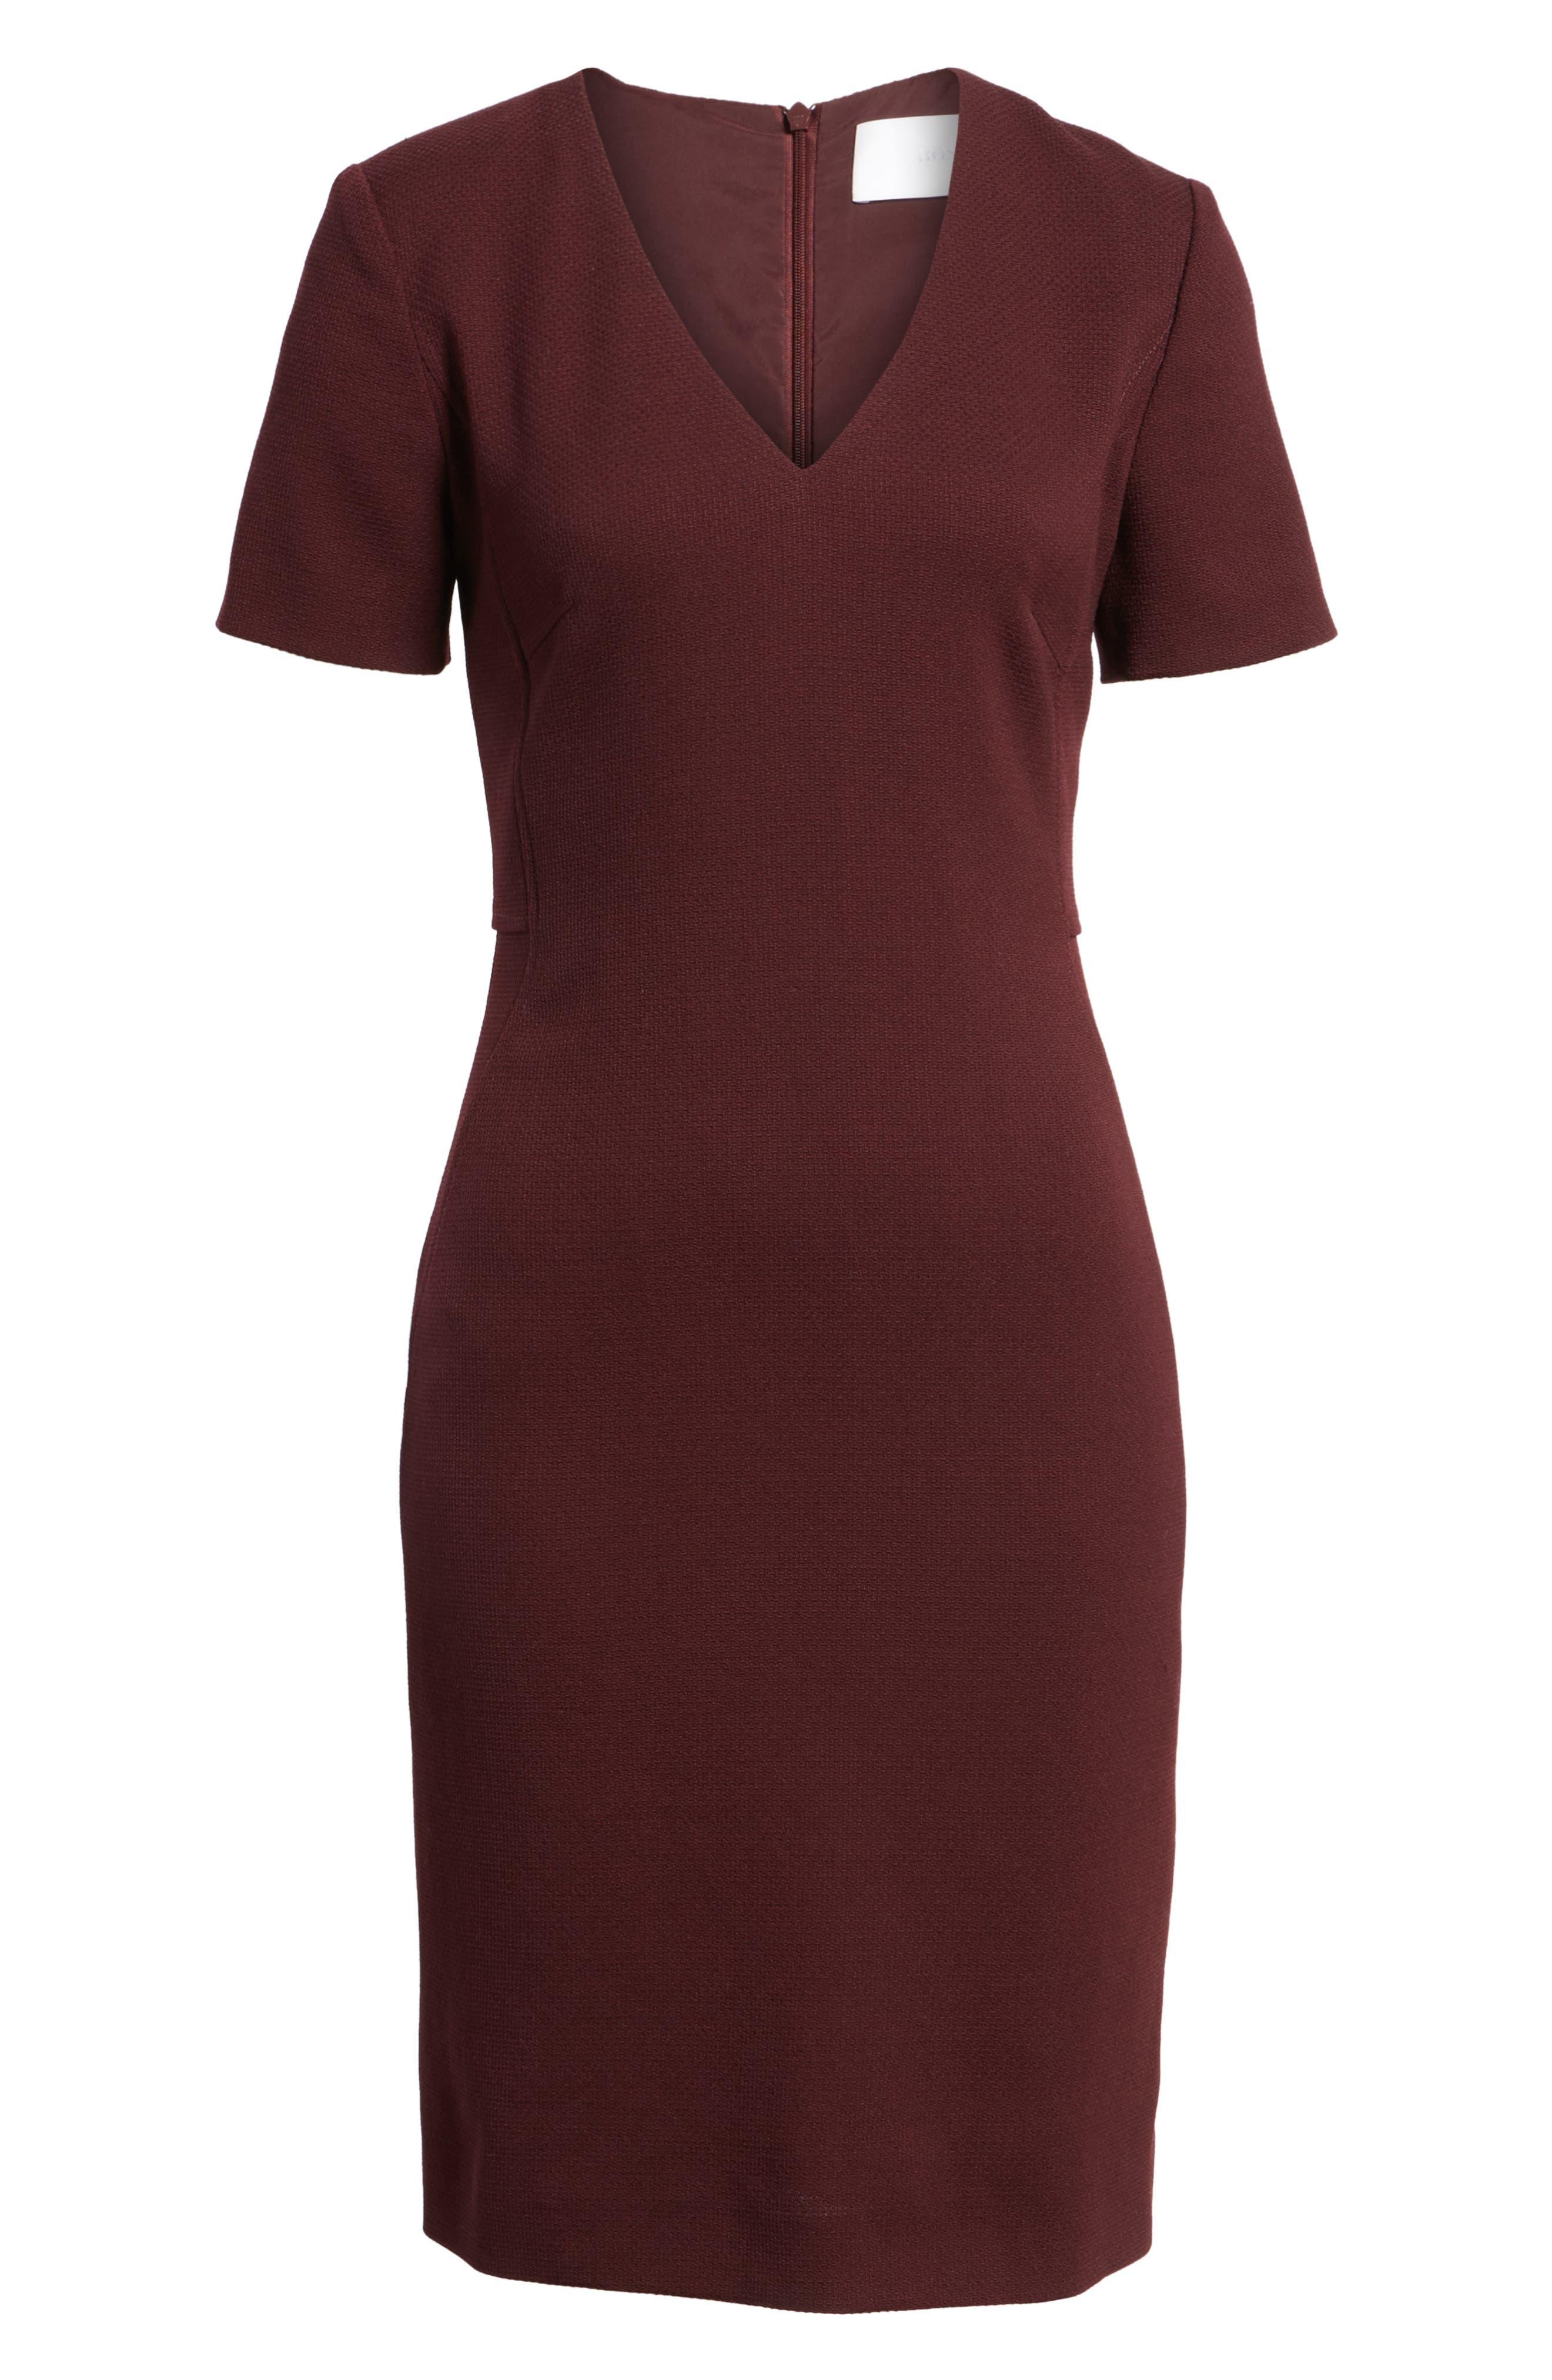 Domandia Stretch Wool Sheath Dress,                             Alternate thumbnail 6, color,                             Mulberry